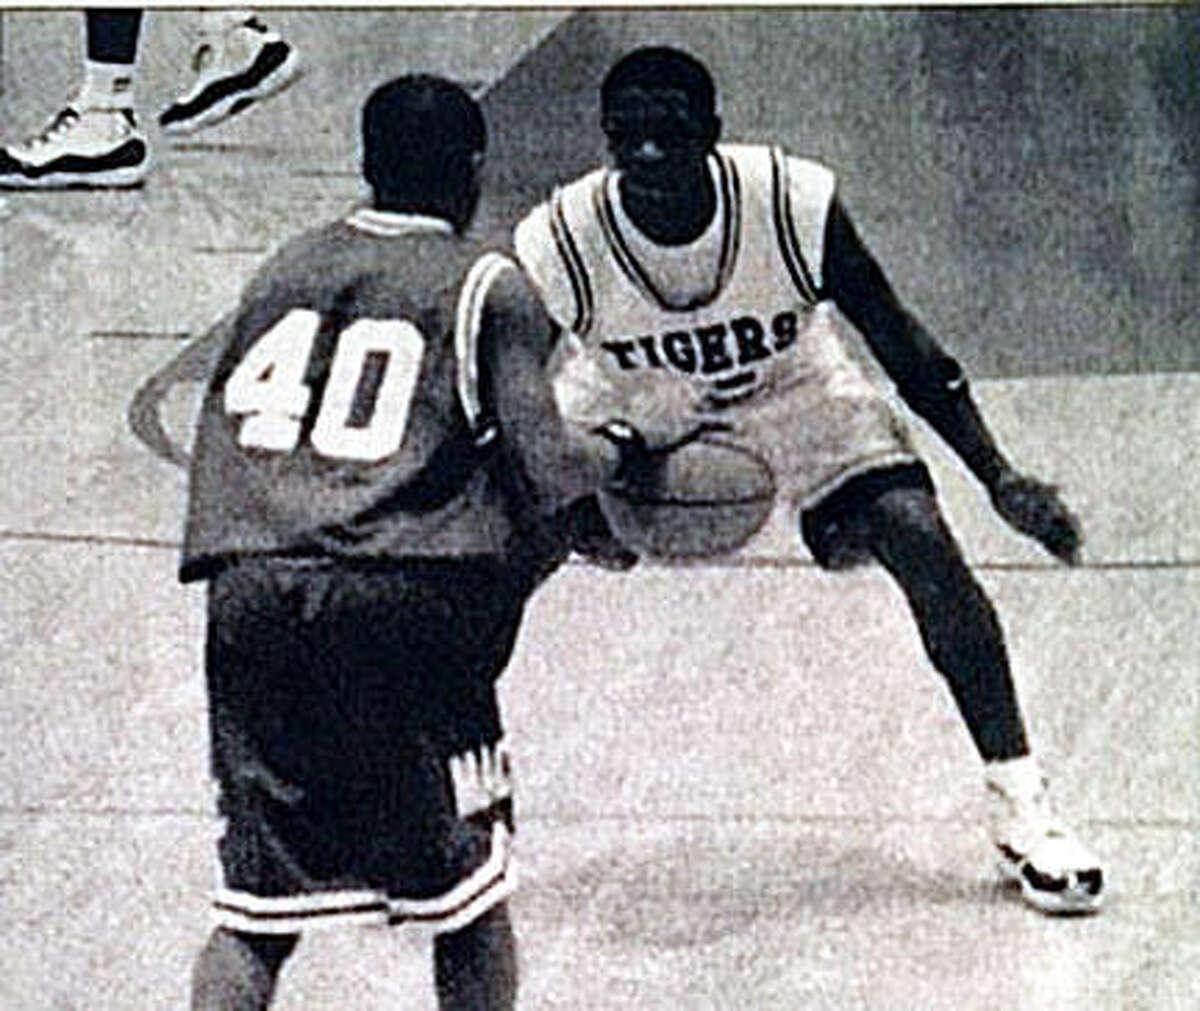 Edwardsville's Ryan Jumper, right, plays defense during his junior season at EHS in 1994-95.